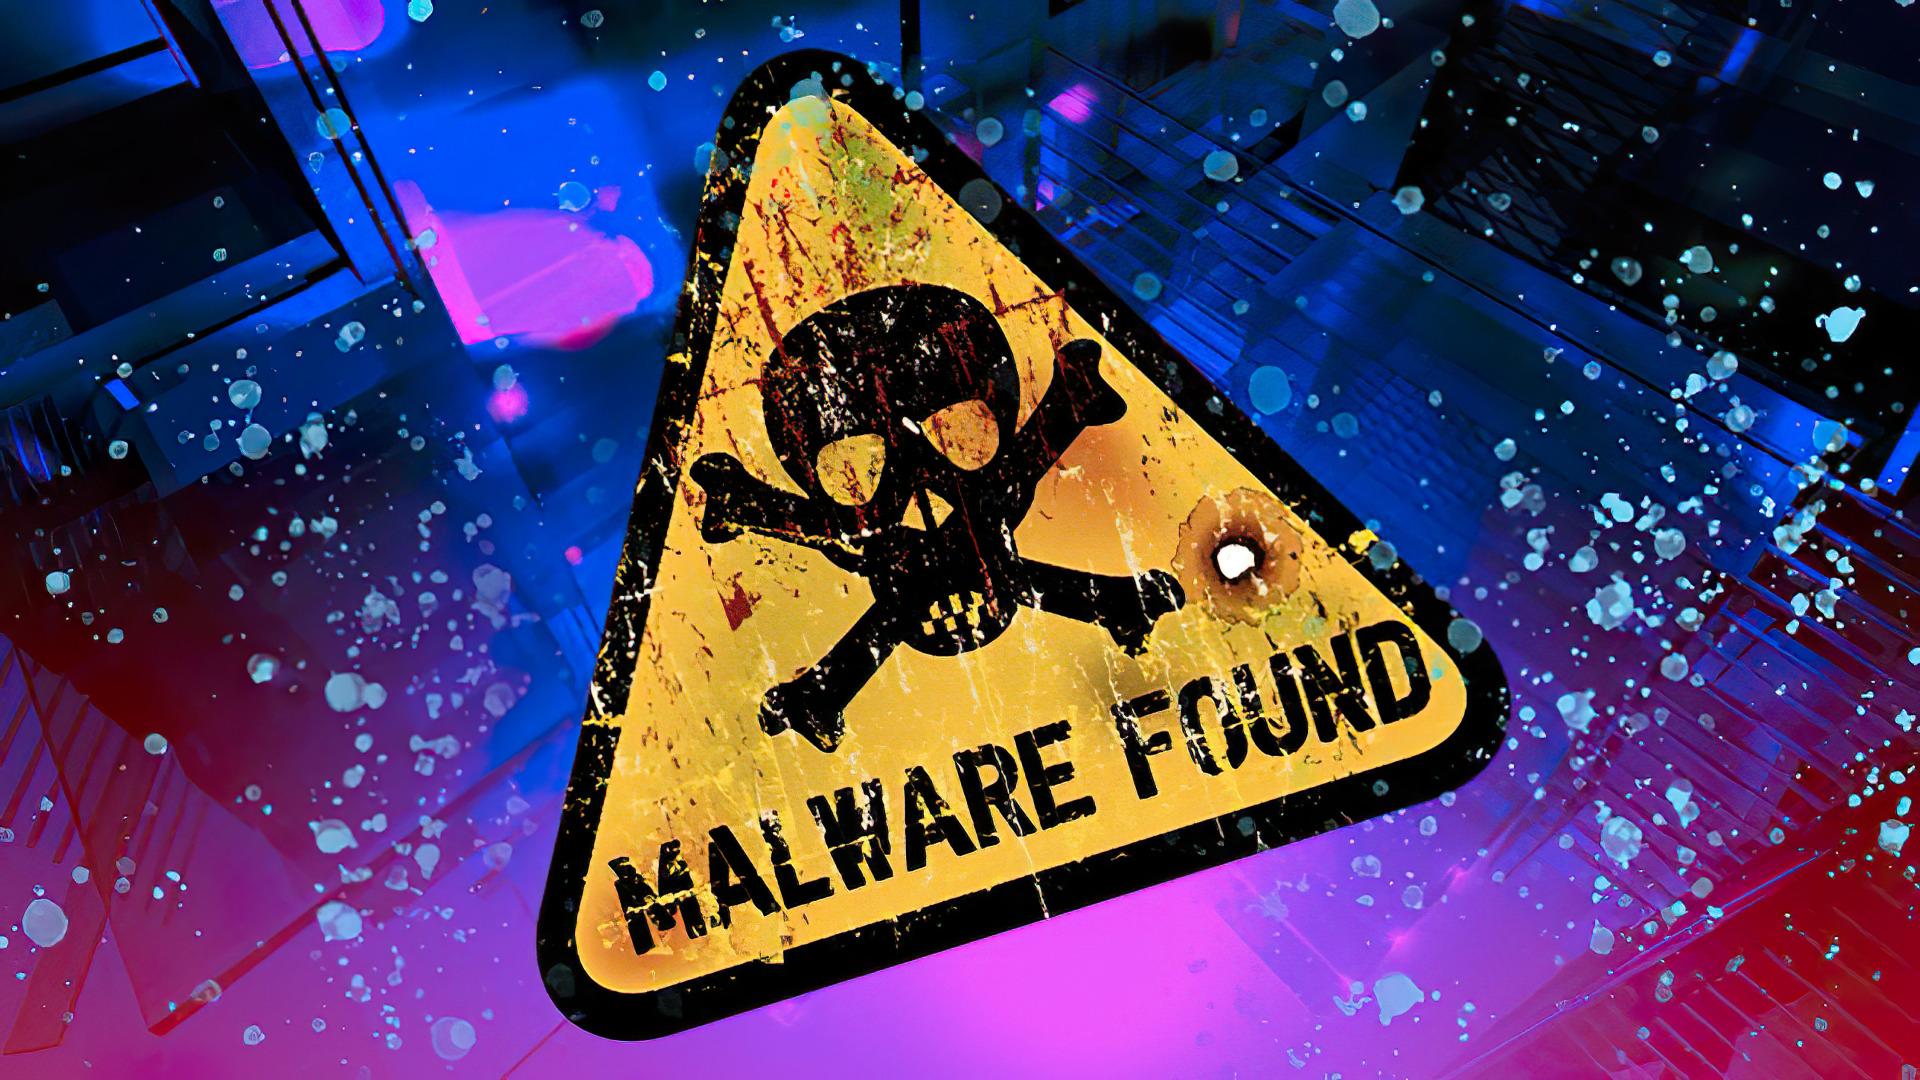 Sicherheitslücke, Hacker, Security, Malware, Hack, Angriff, Virus, Kriminalität, Schadsoftware, Exploit, Cybercrime, Cybersecurity, Hacking, Hackerangriff, Internetkriminalität, Sicherheitslücken, Darknet, Hacken, Hacker Angriffe, Hacker Angriff, Sicherheitsupdate, Attack, Hacks, Kurs, anti-malware, Crime, Cyberwar, China Hacker, Russische Hacker, Malware Warnung, Risiko, Sicherheitsrisiko, Sicherheitsproblem, Cyberangriff, Cyberattacke, Totenkopf, tot, Dead, Malware Found, Hazard, Skull